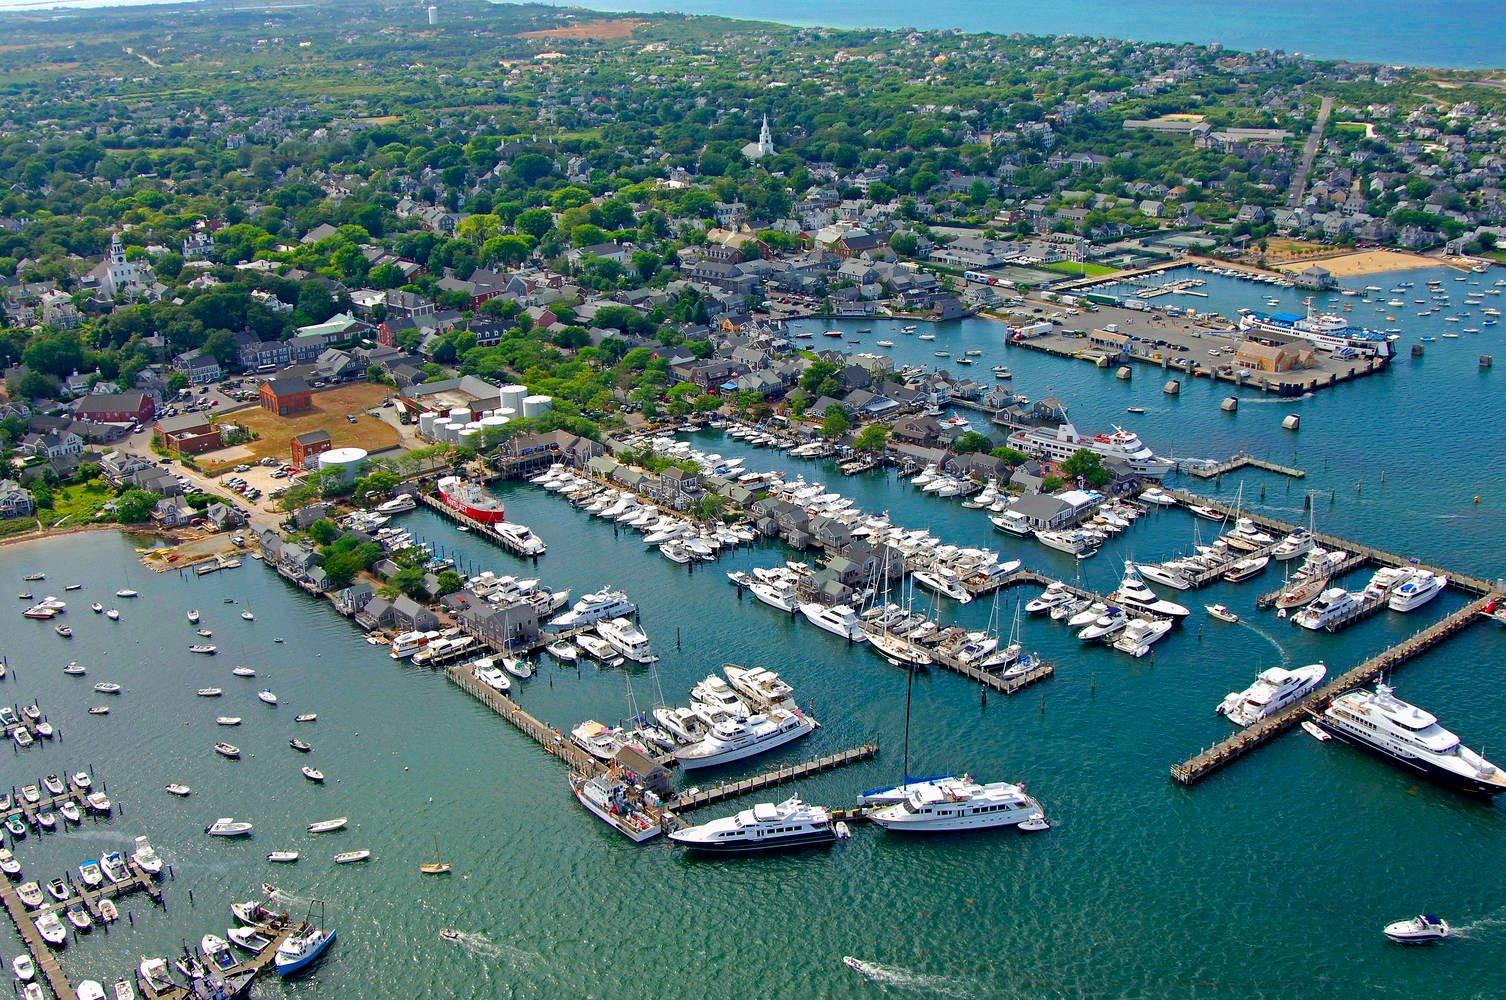 Nantucket Boat Basin - present day